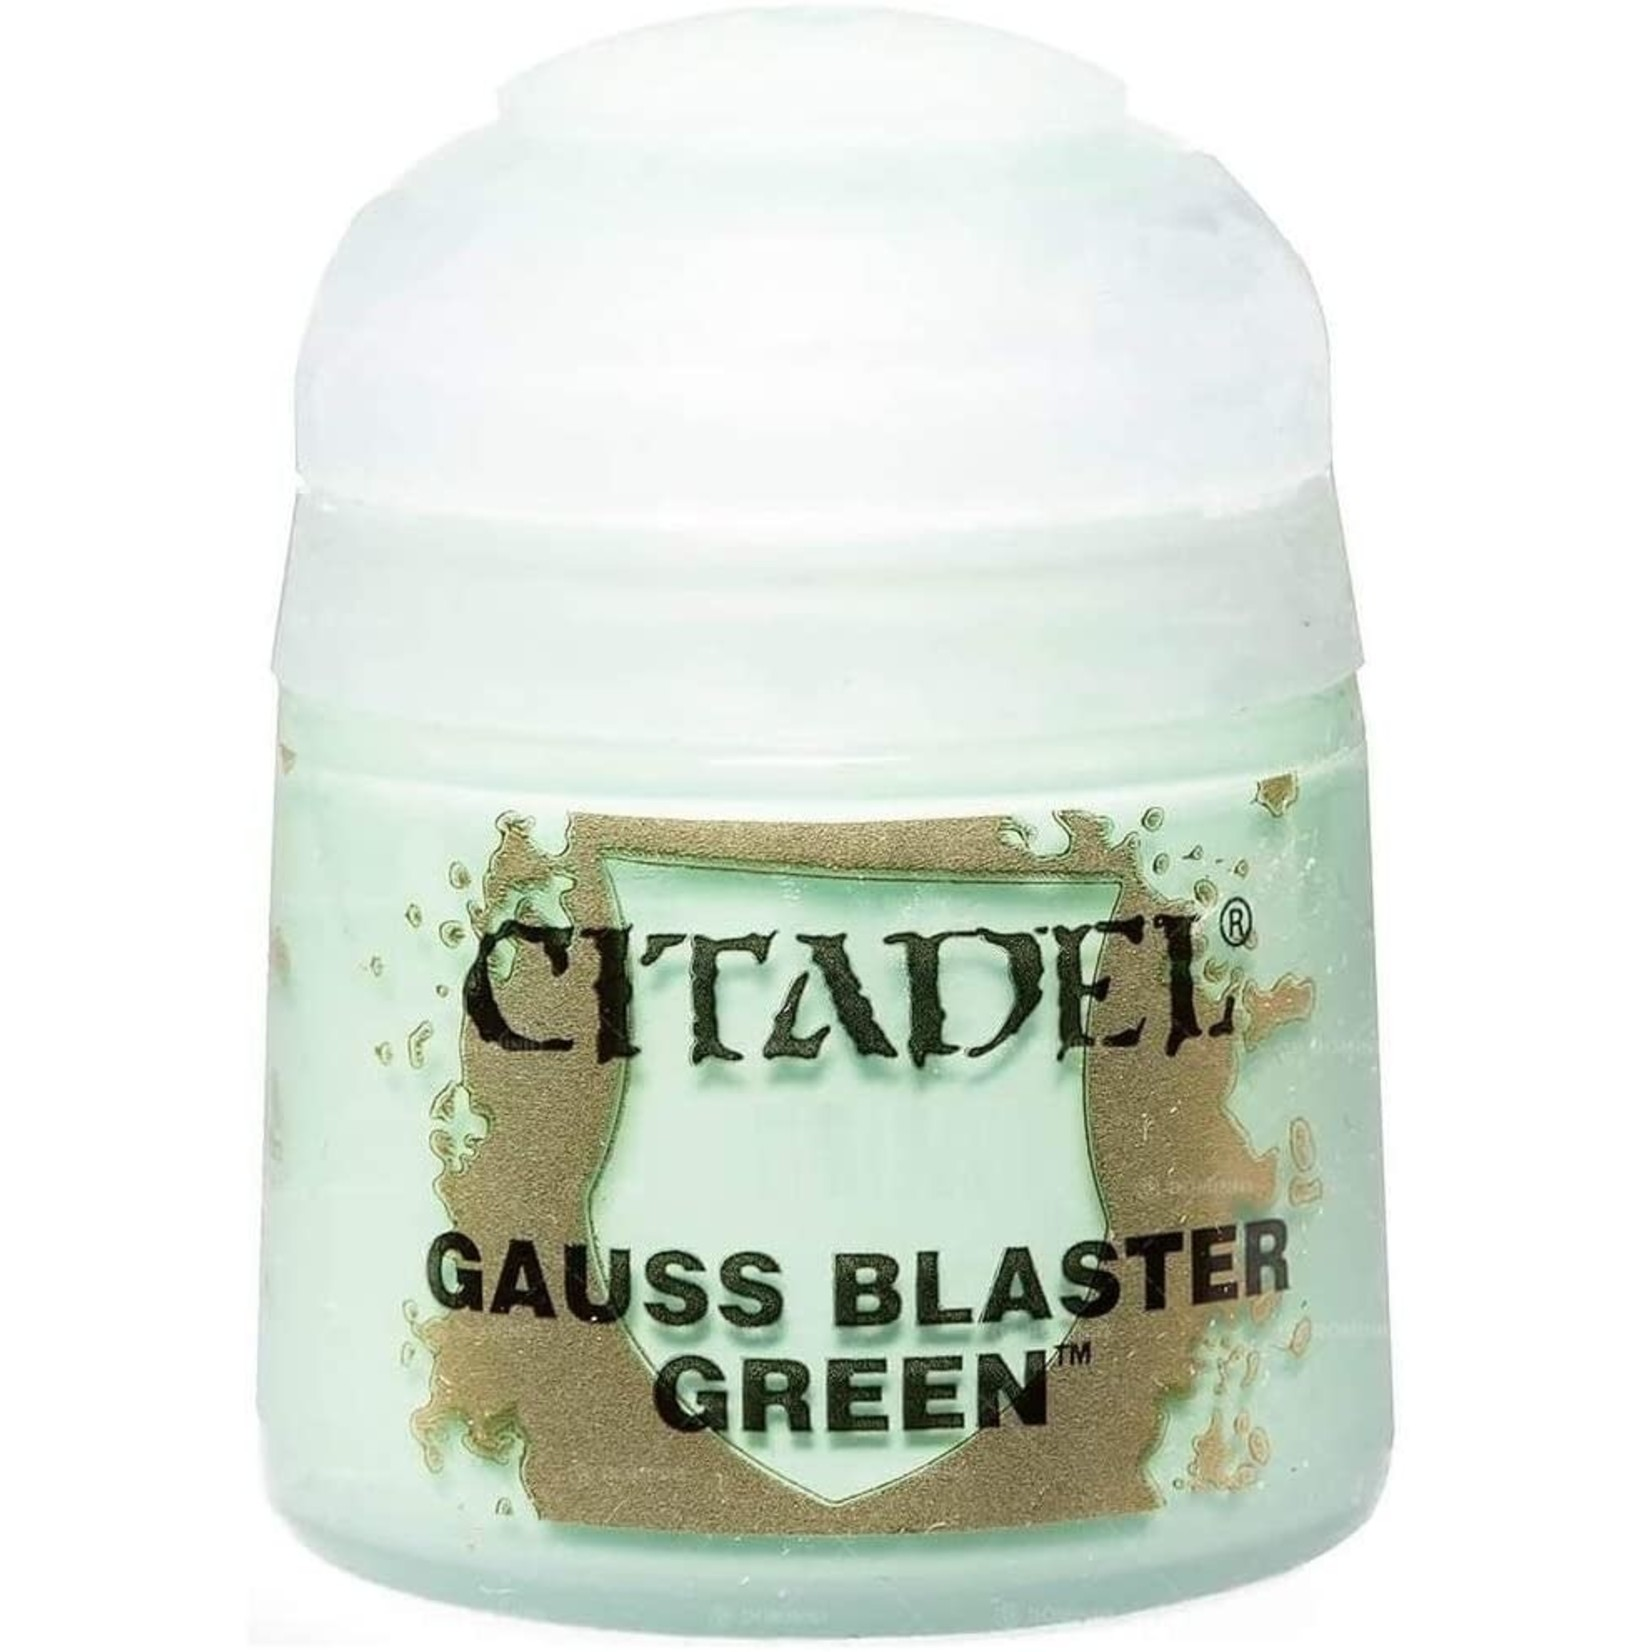 Games Workshop Citadel Paint: Gauss Blaster Green 12ml